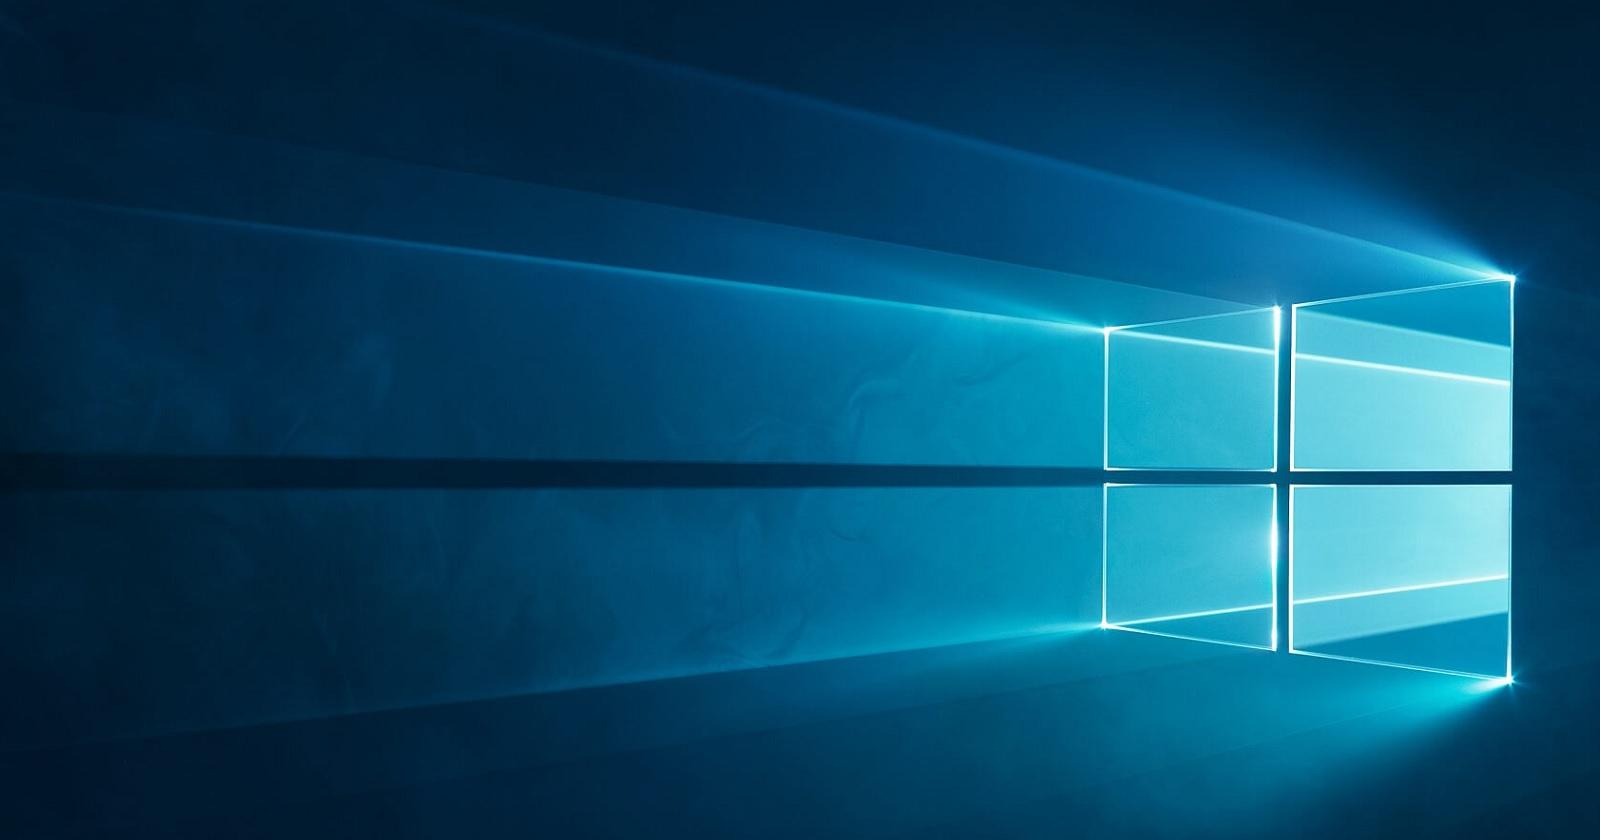 Windows 10 KB4586819